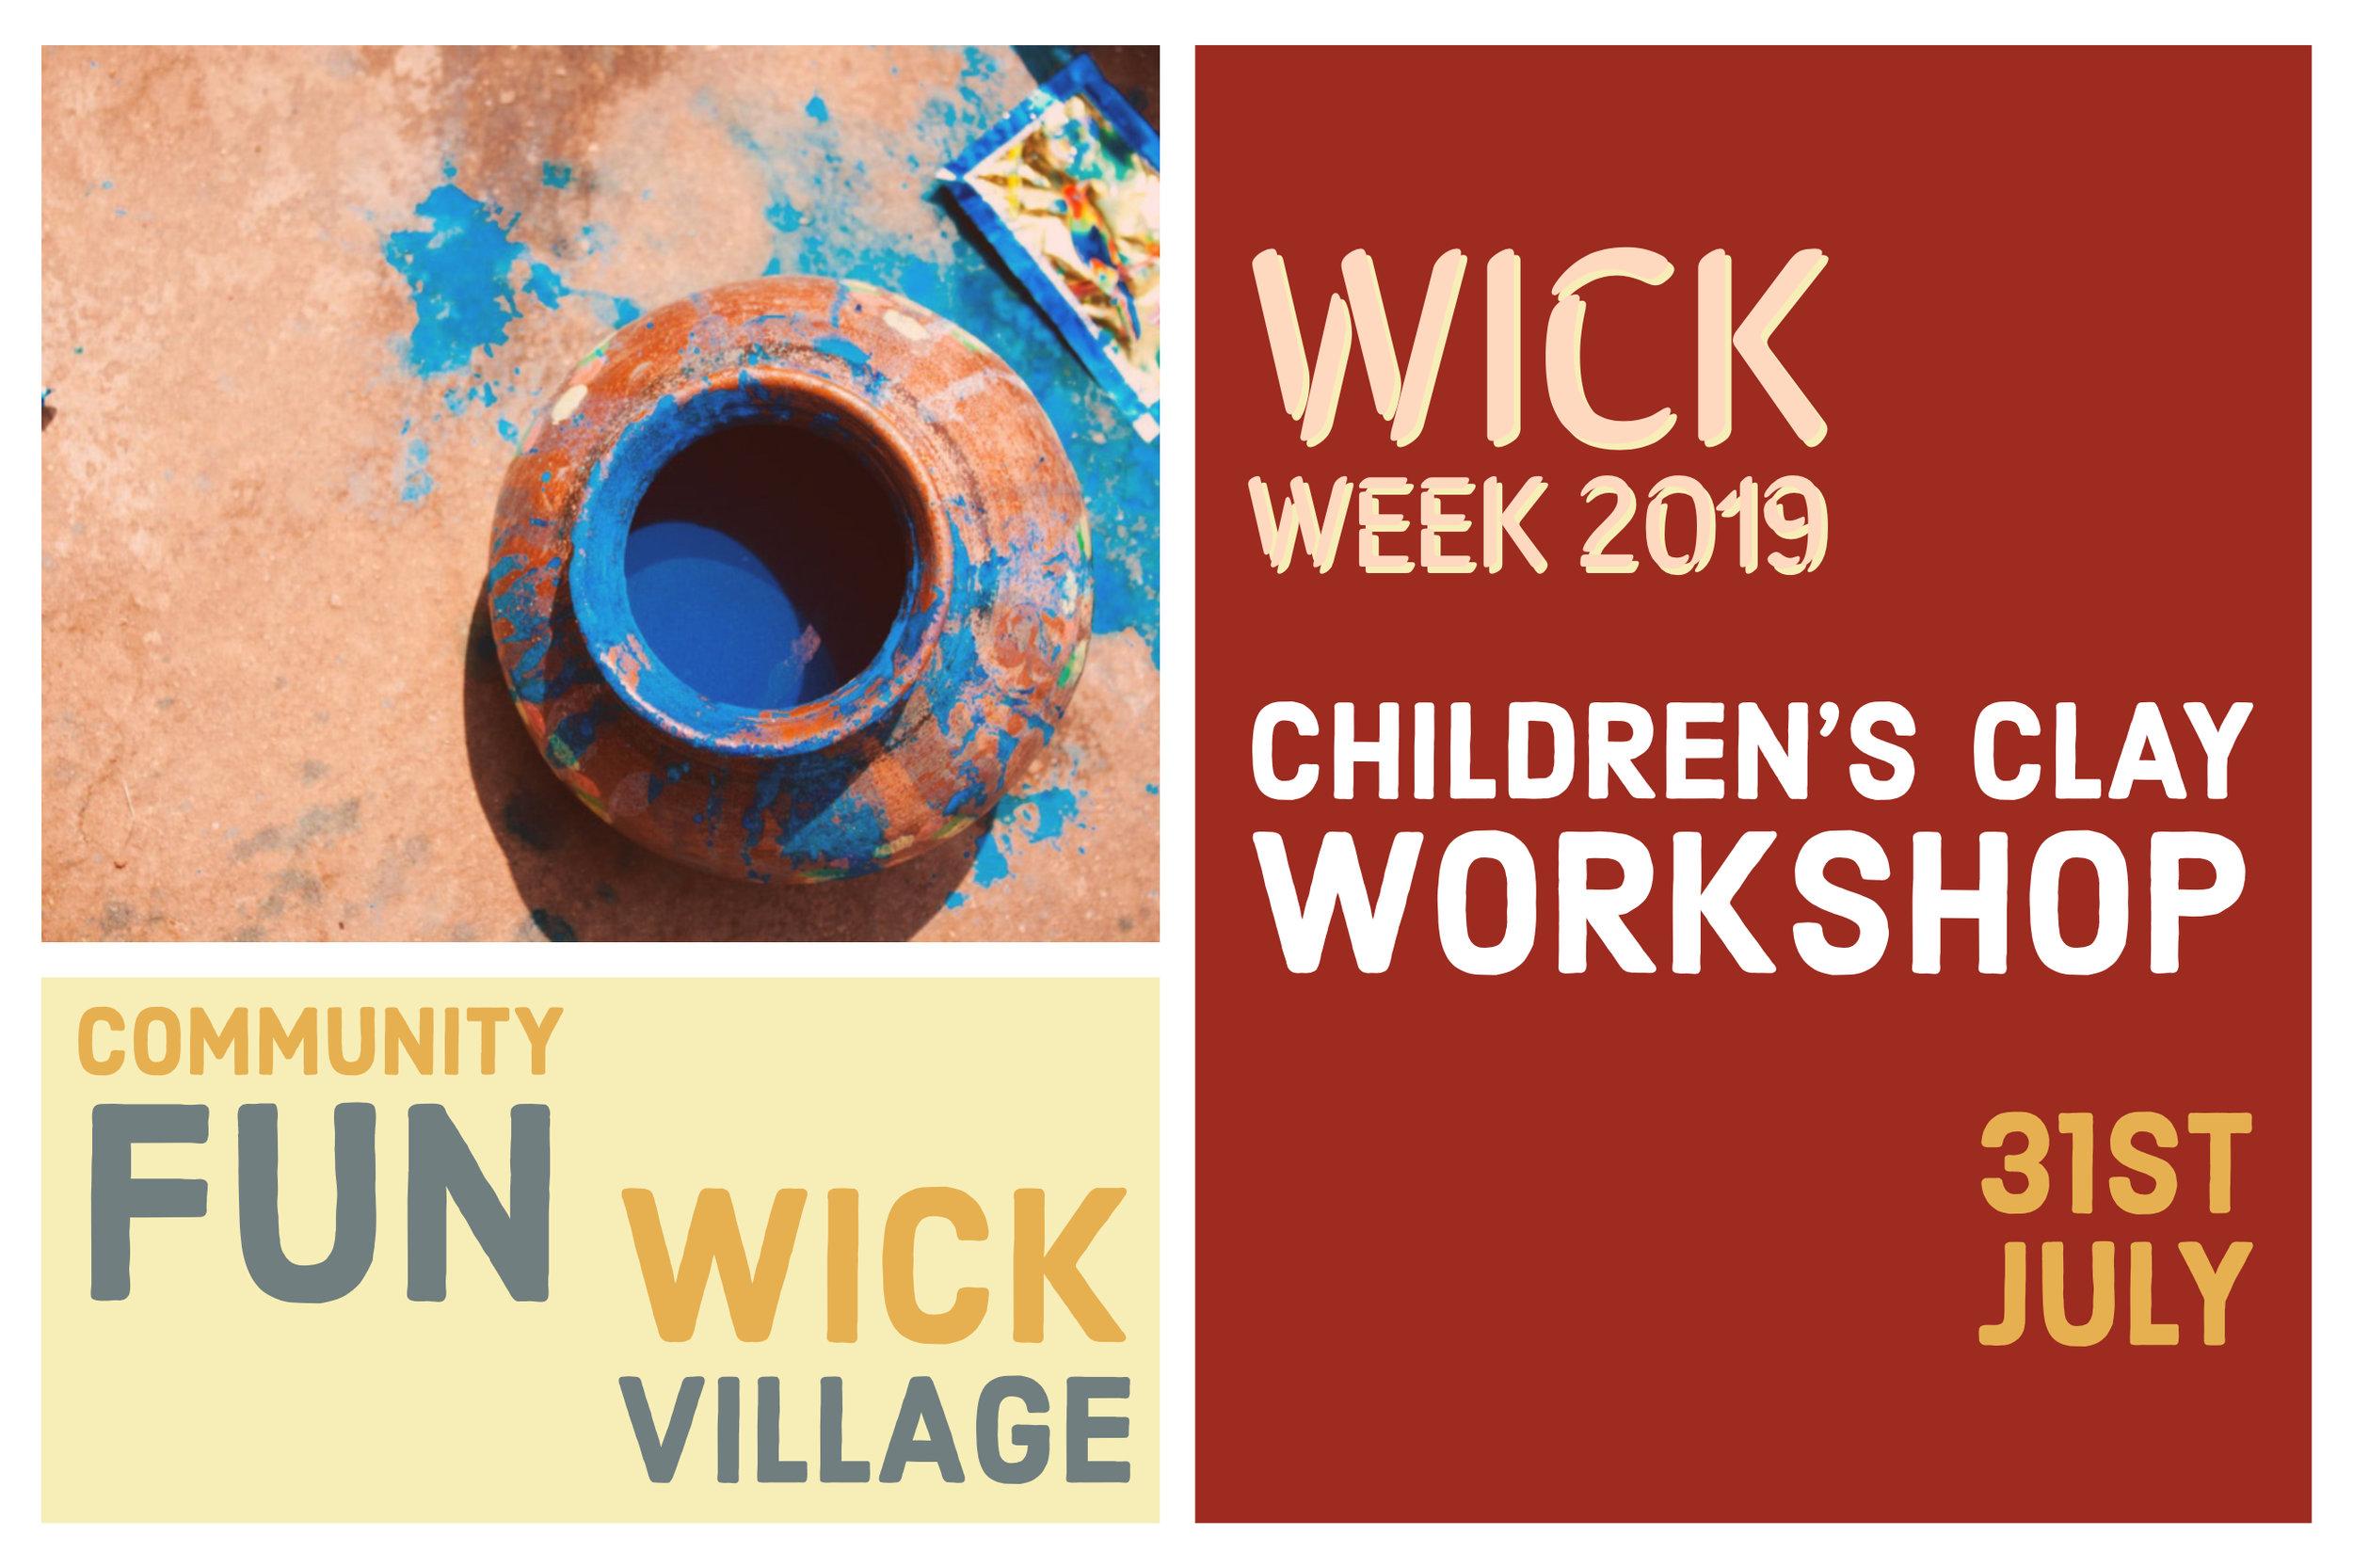 Wick Week 2019 - Children's Clay Workshop.